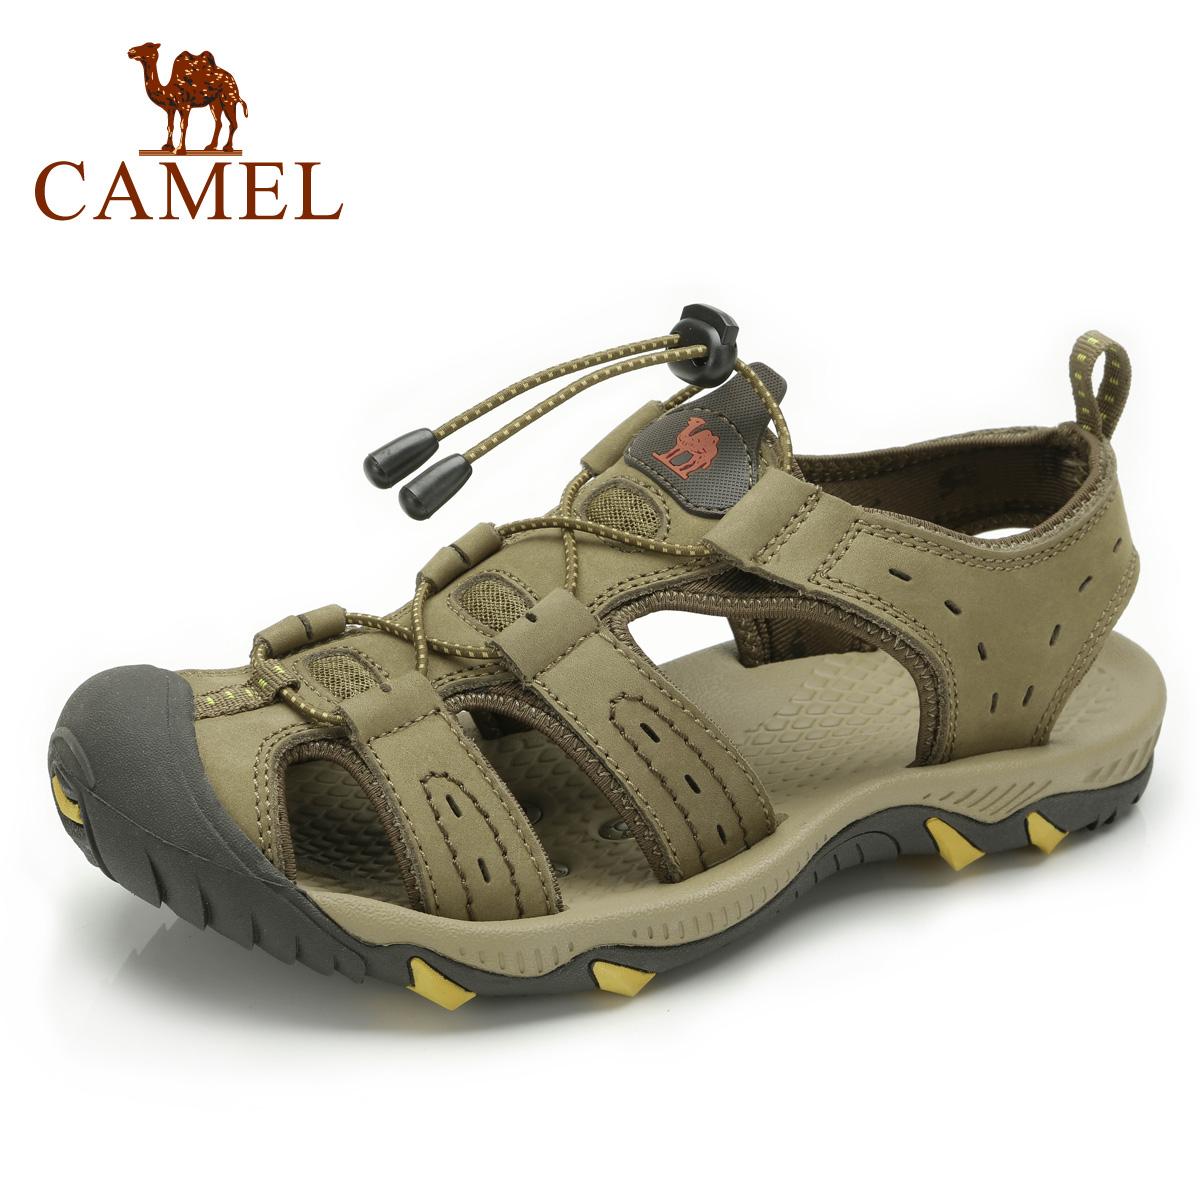 camel骆驼 男凉鞋 正品2013新品 沙滩鞋 户外休闲 男款 82396604